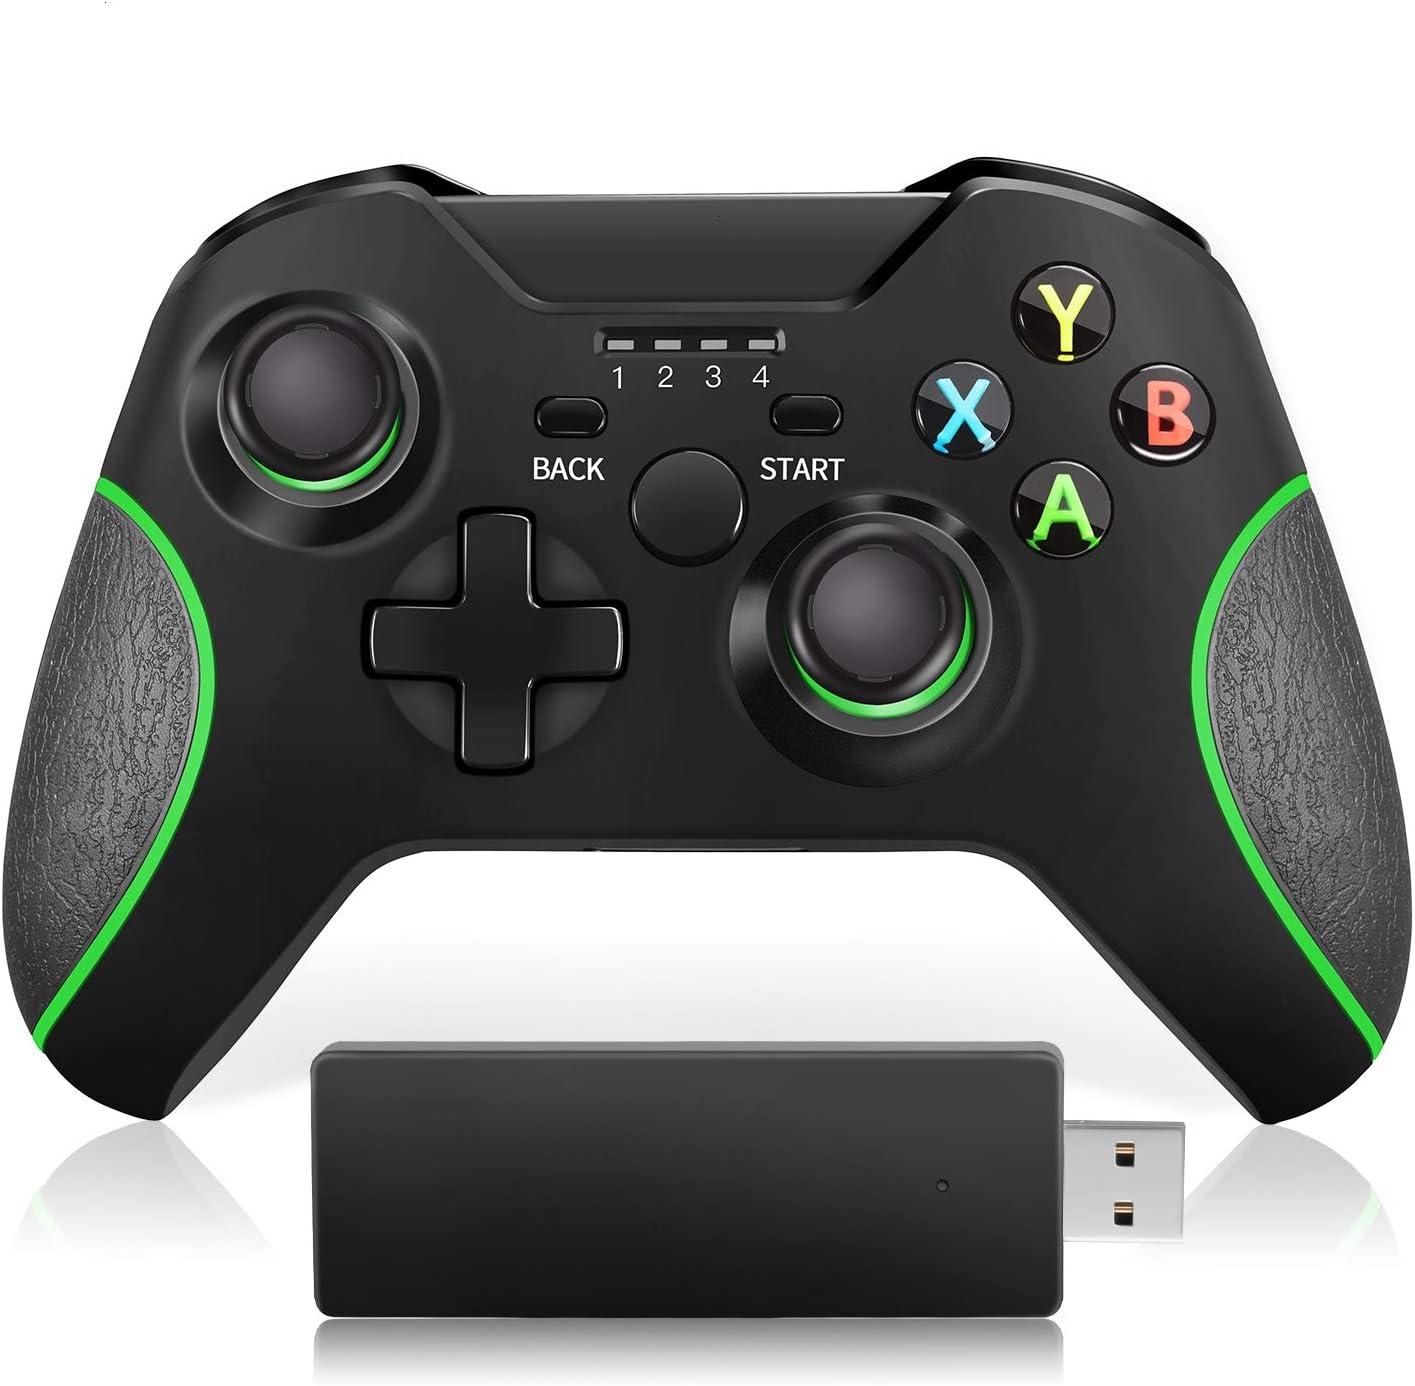 VOYEE Mando inalámbrico Mejorado Gamepad para Xbox One/One S/ One ...